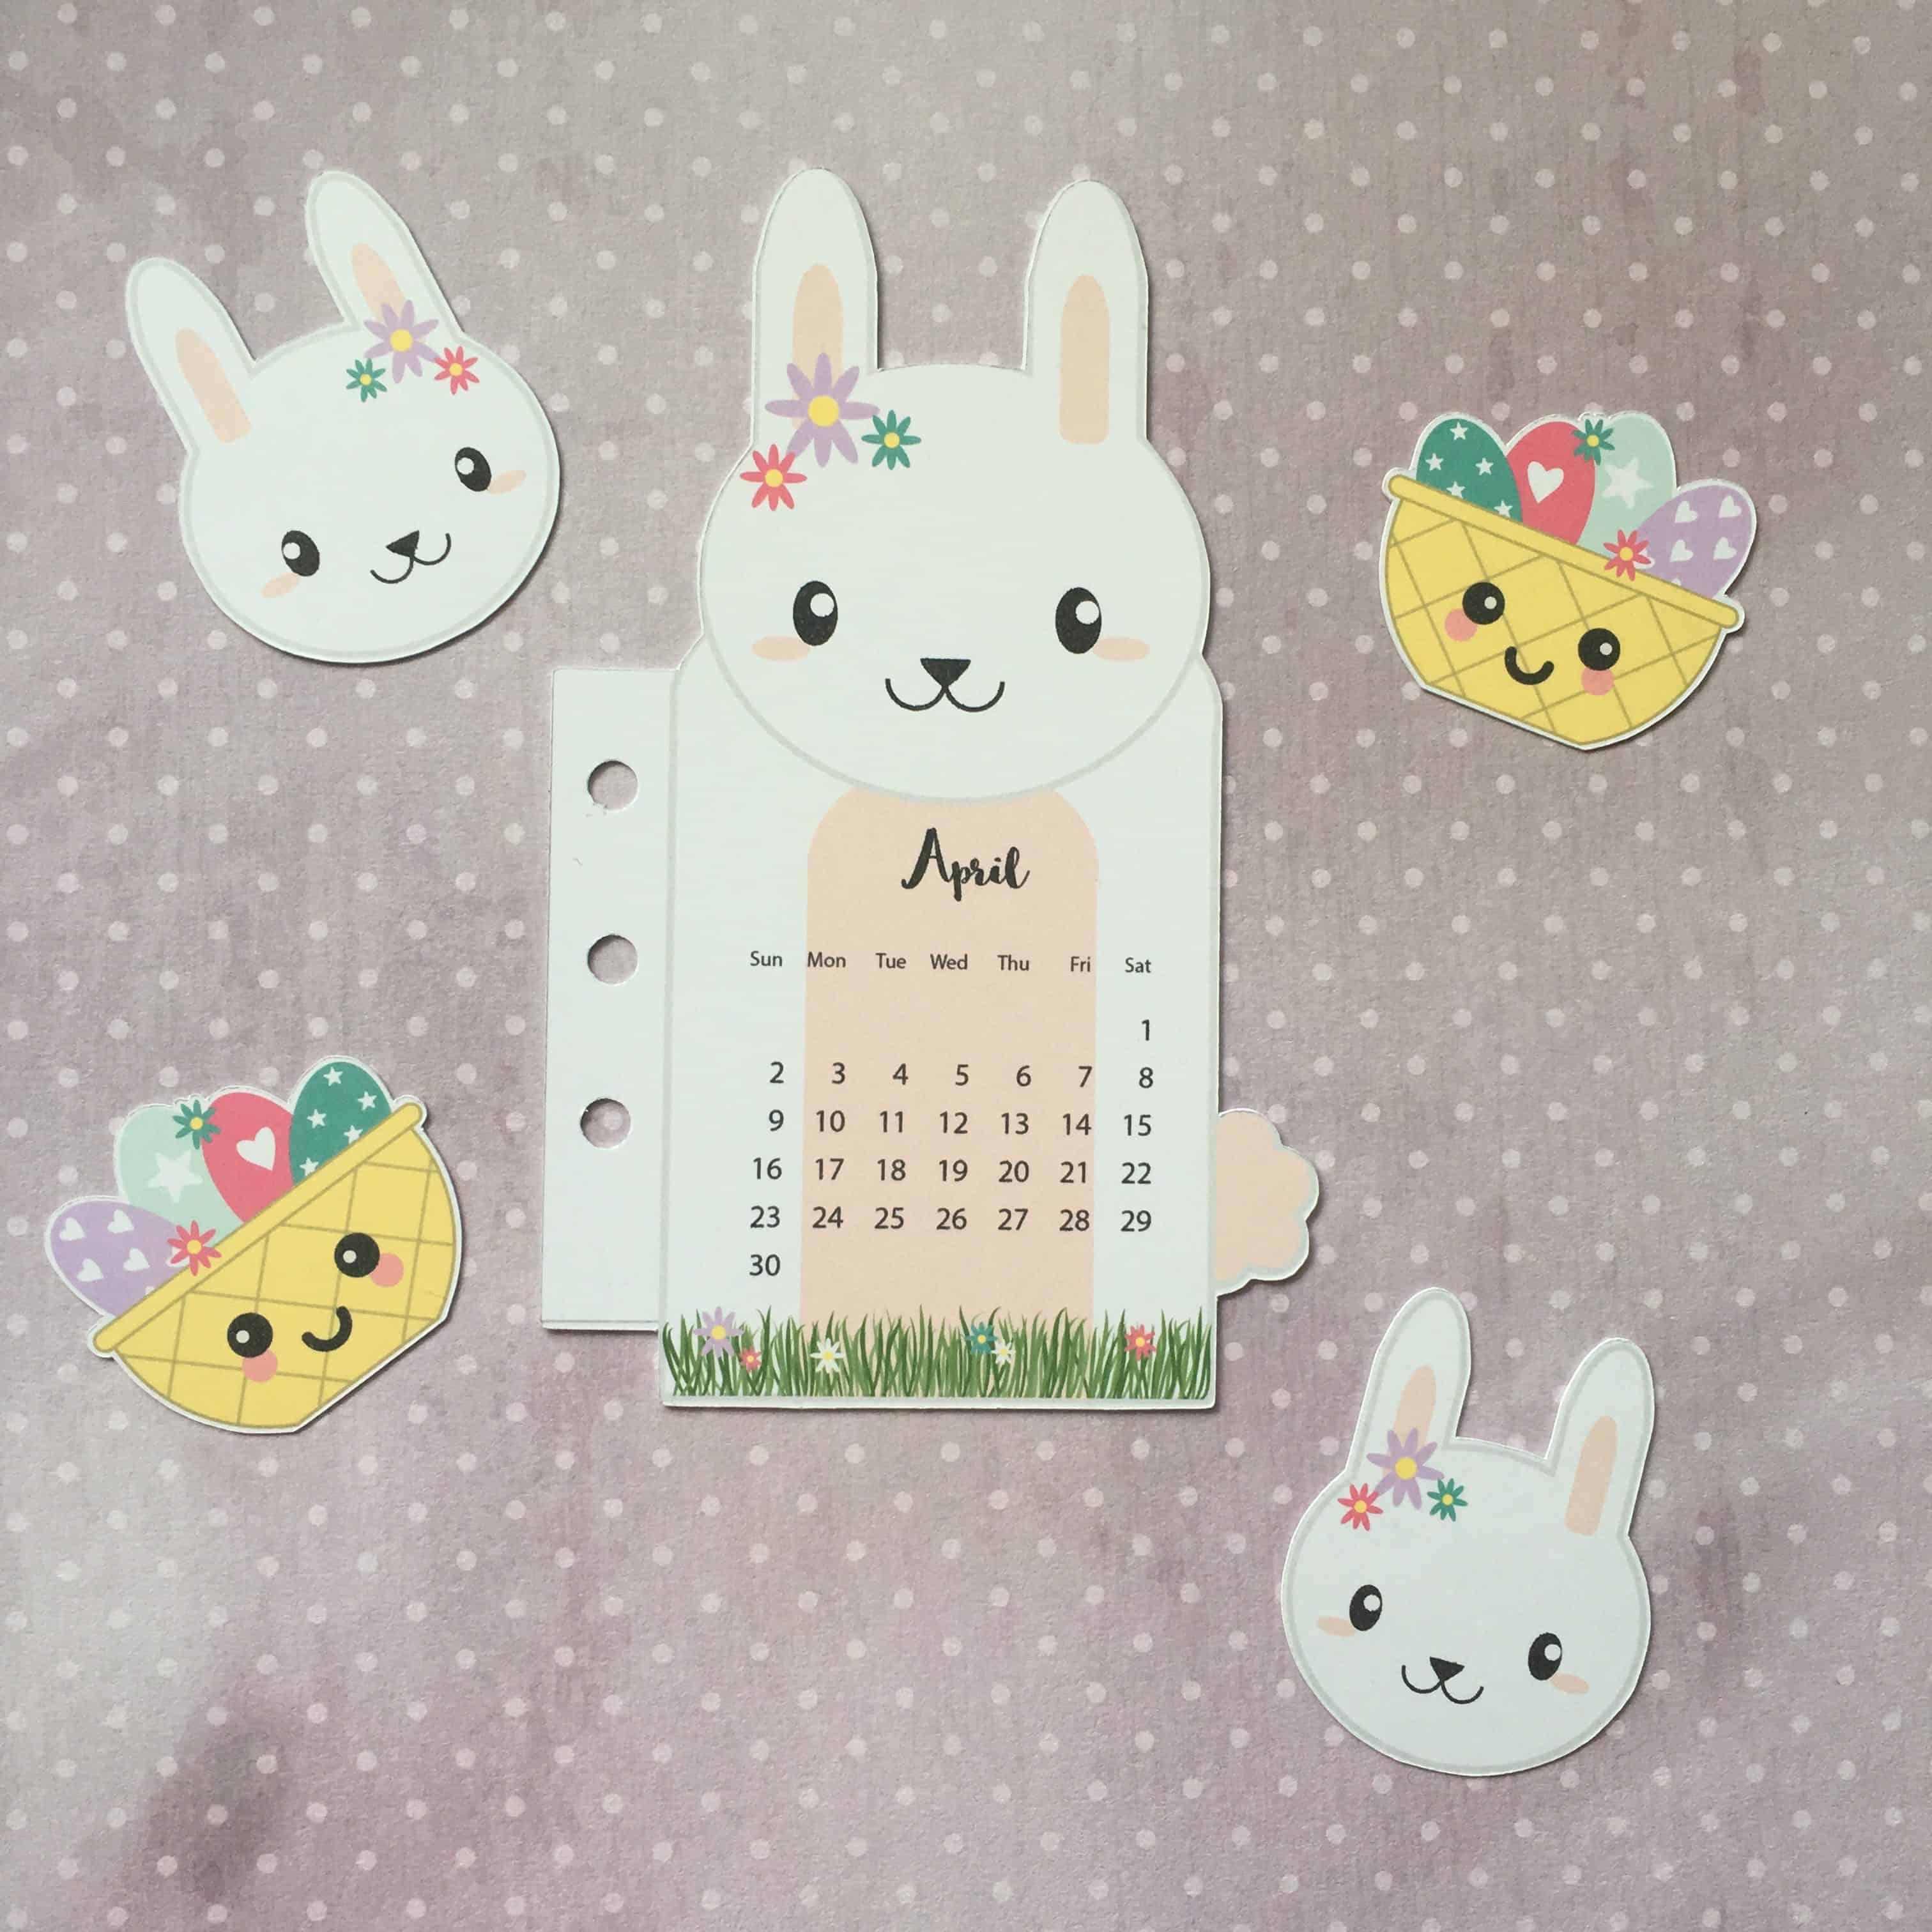 Bunny Rabbit Printable Planner Calendar